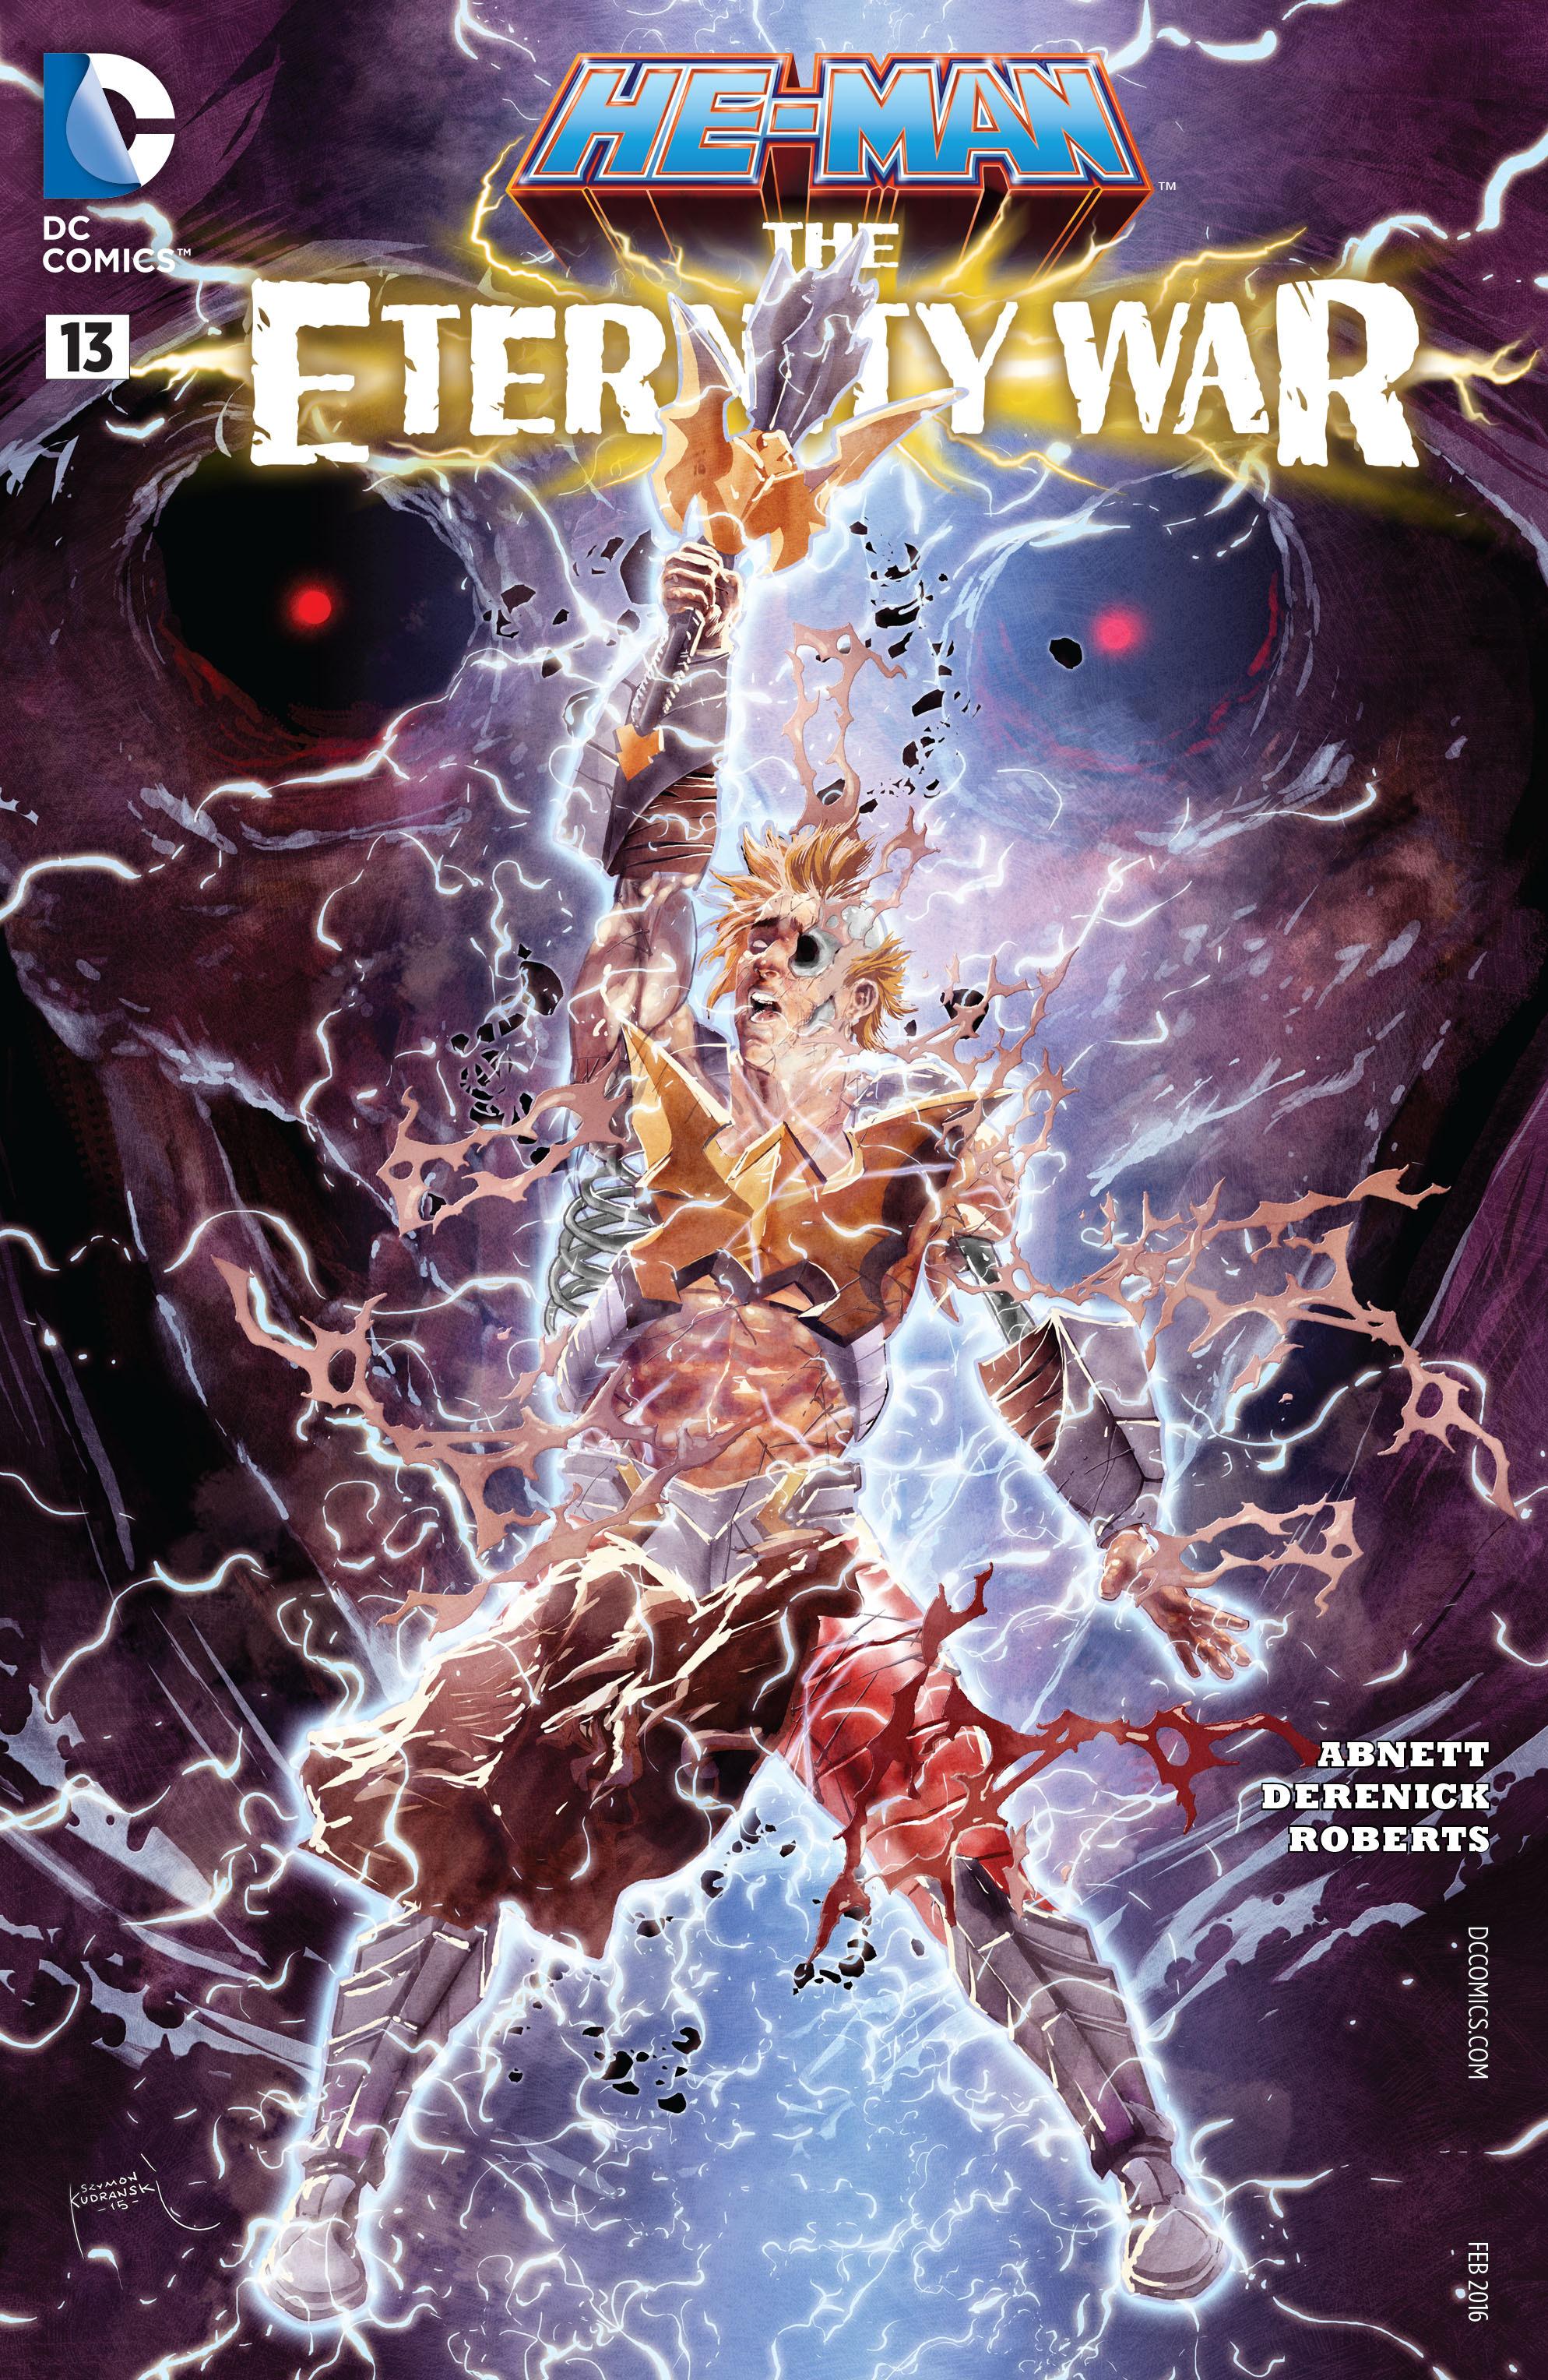 He-Man: The Eternity War Vol 1 13